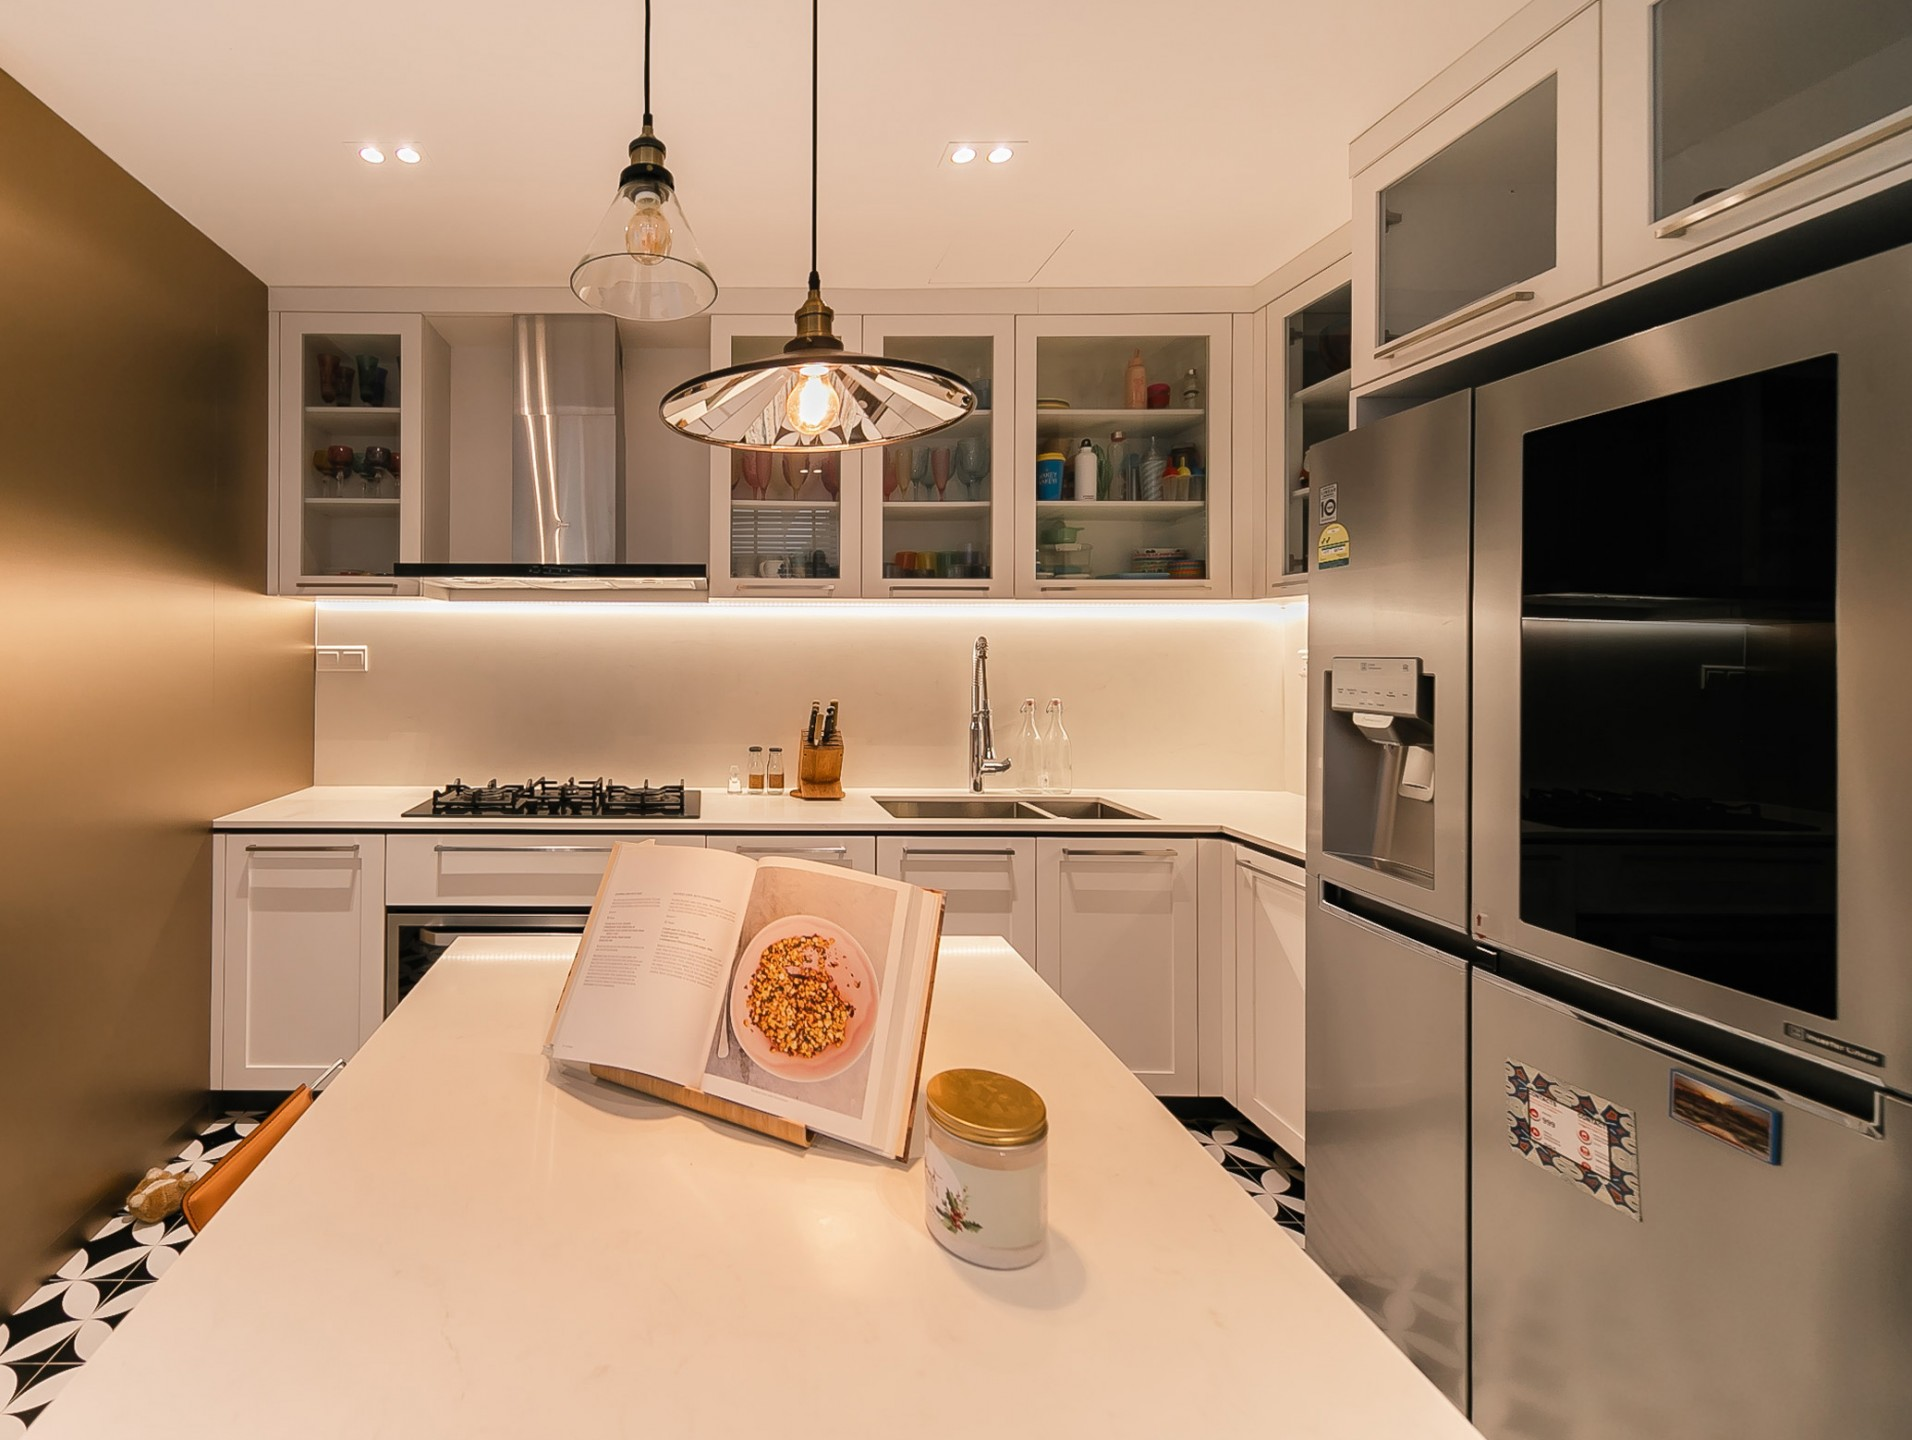 squarerooms-caesarstone-kitchen-contemporary-steel-stylish